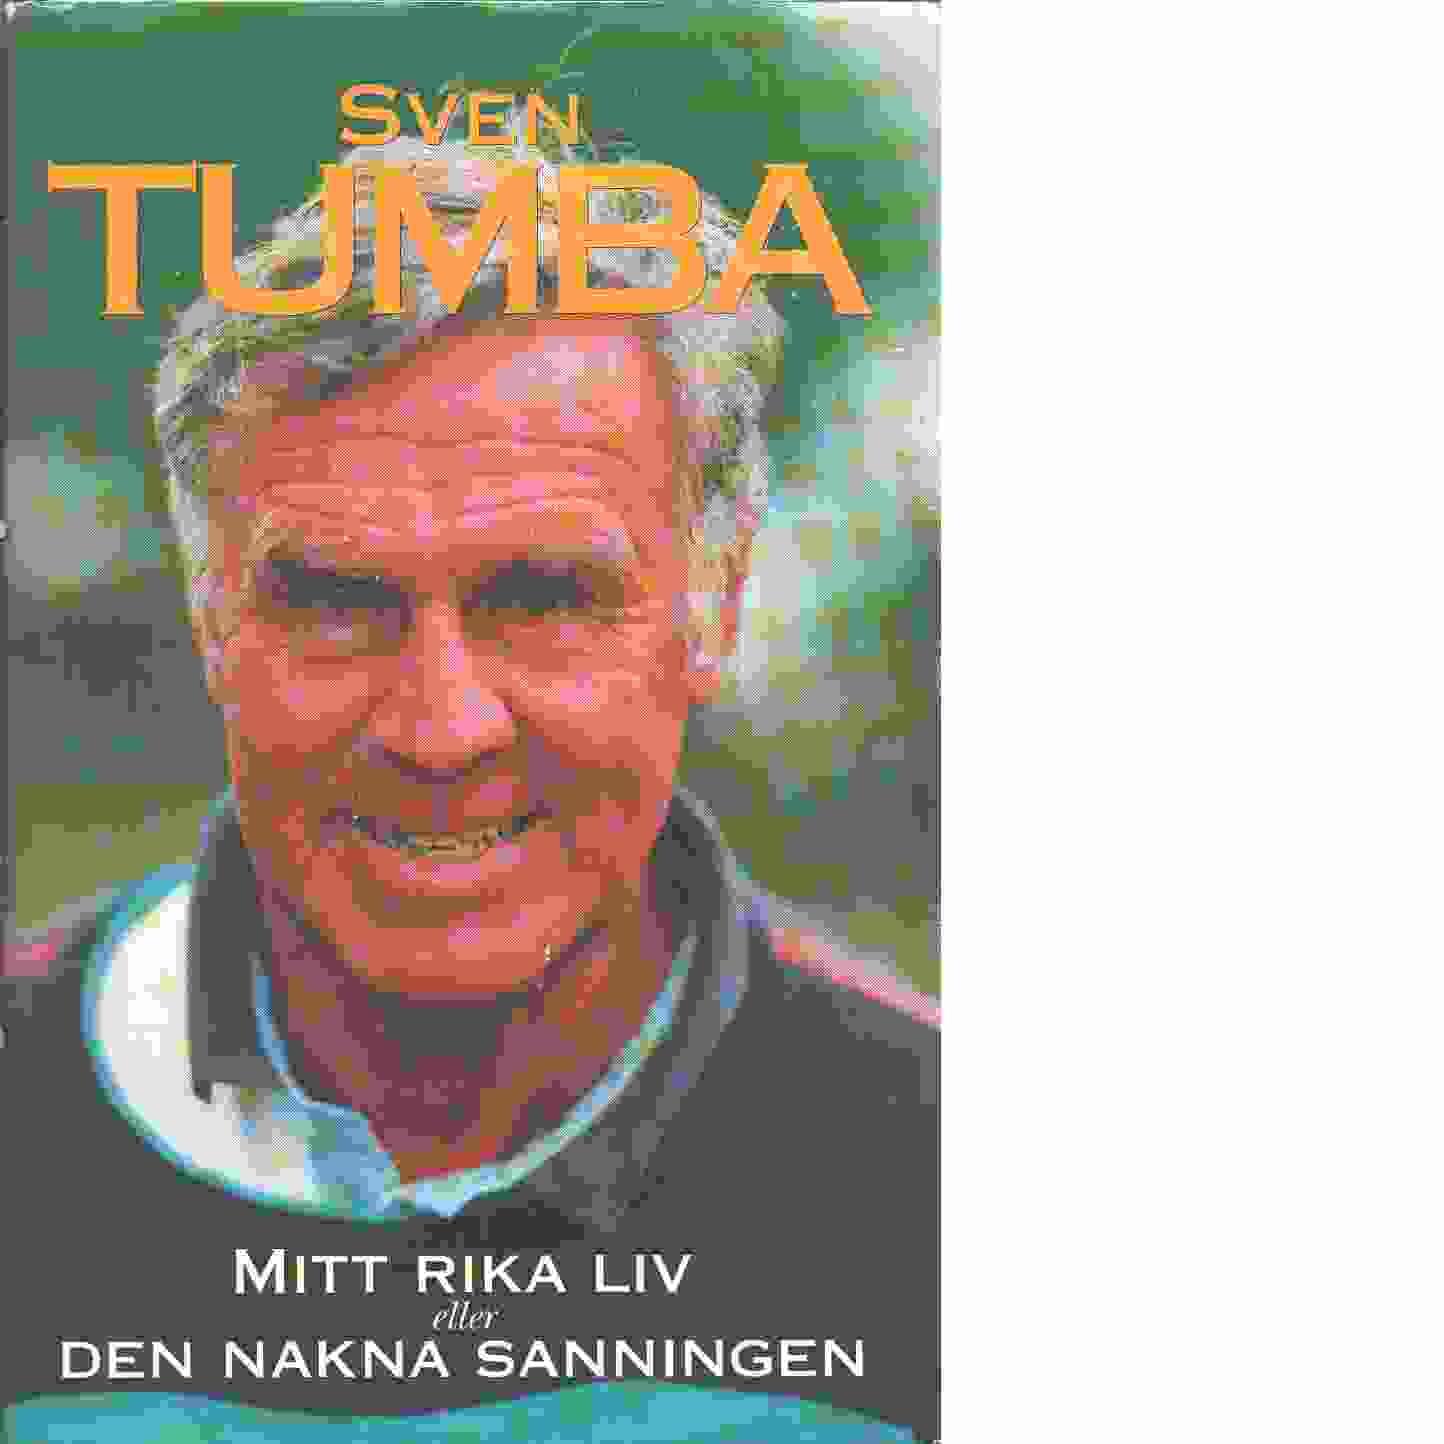 Mitt rika liv eller Den nakna sanningen  - Tumba, Sven